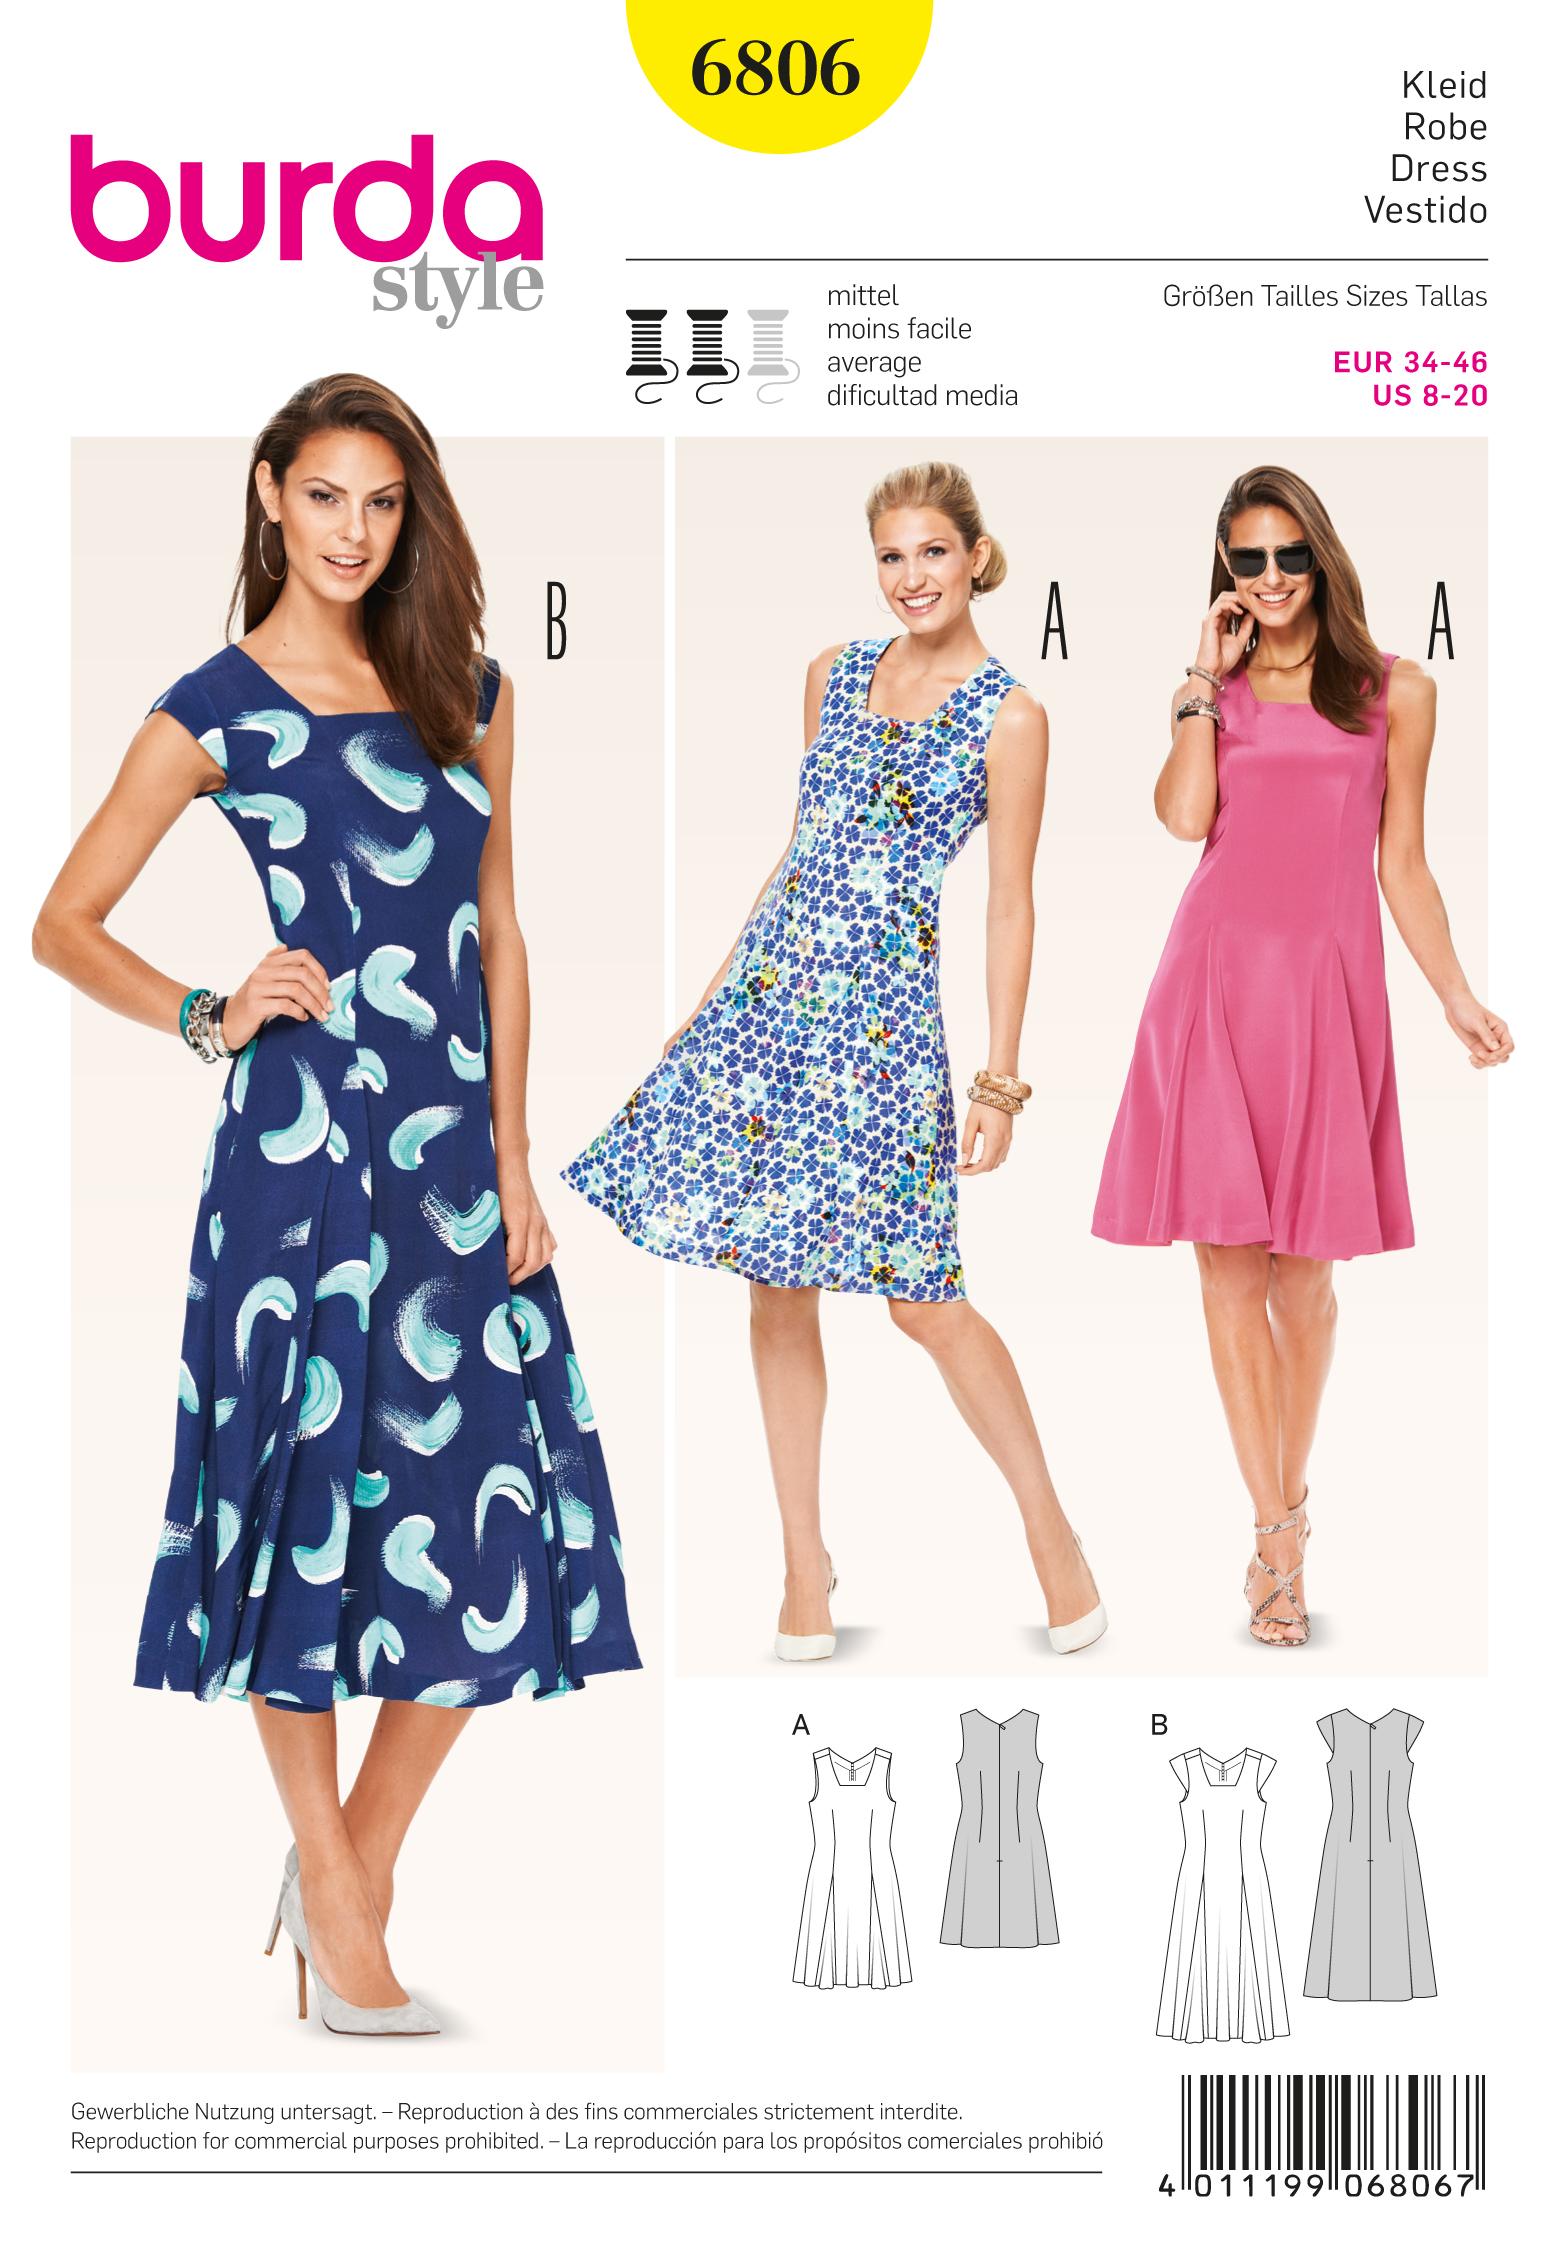 Burda 6806 Burda Style Dresses Sewing Pattern